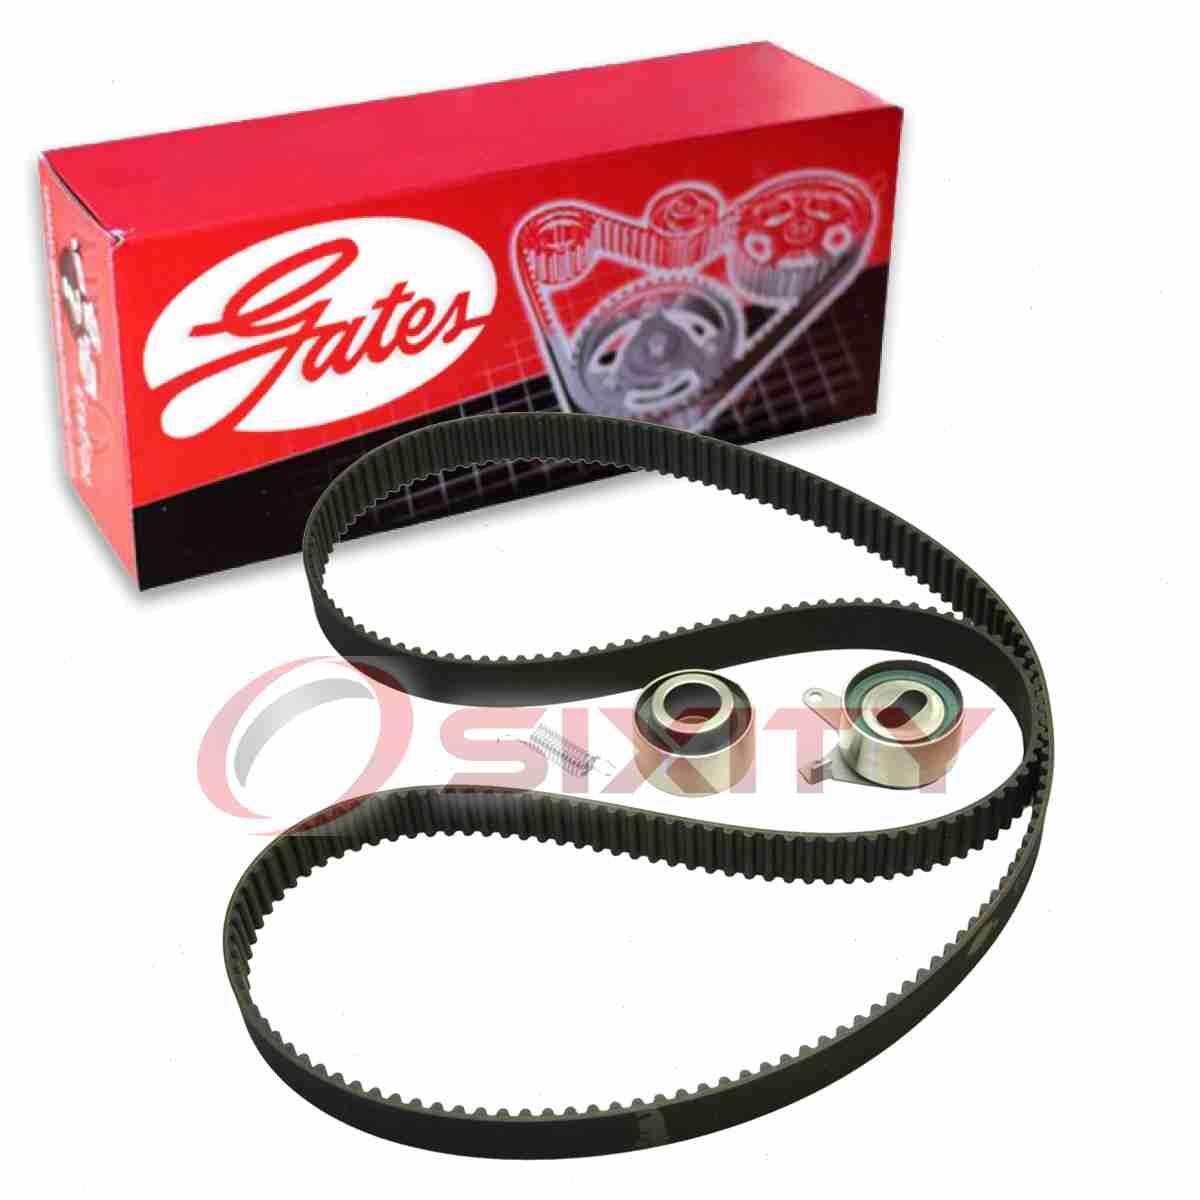 Gates Timing Belt Component Kit for 1990-2005 Mazda Miata 1.6L 1.8L L4 lo